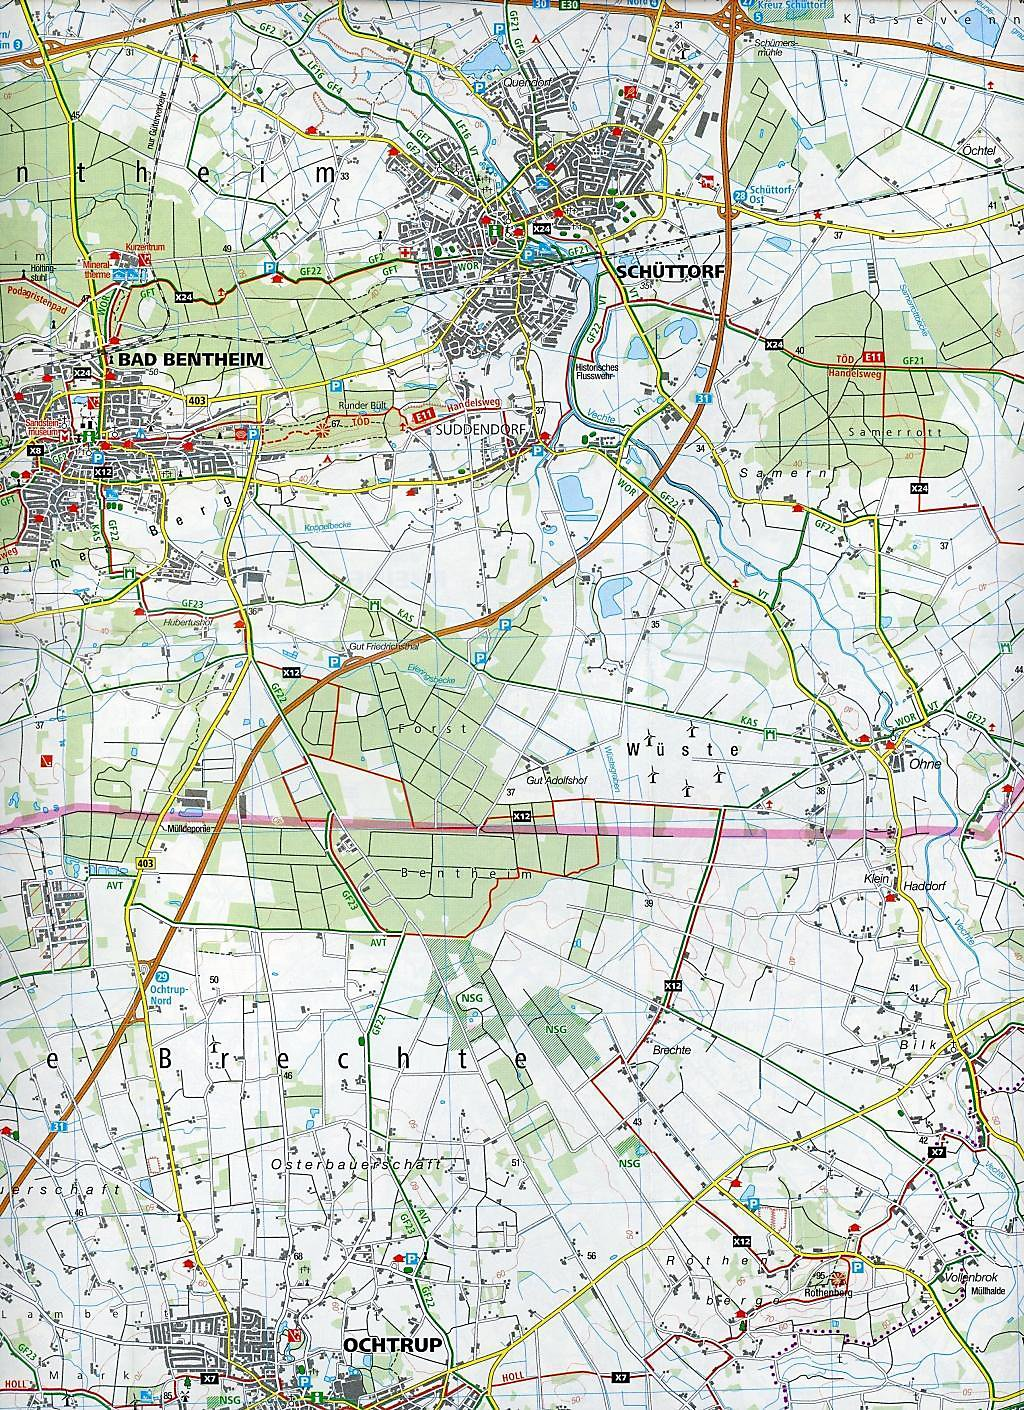 Karte Münsterland.Kompass Karte Münsterland 3 Bl M Kompass Naturführer Wiesenblumen